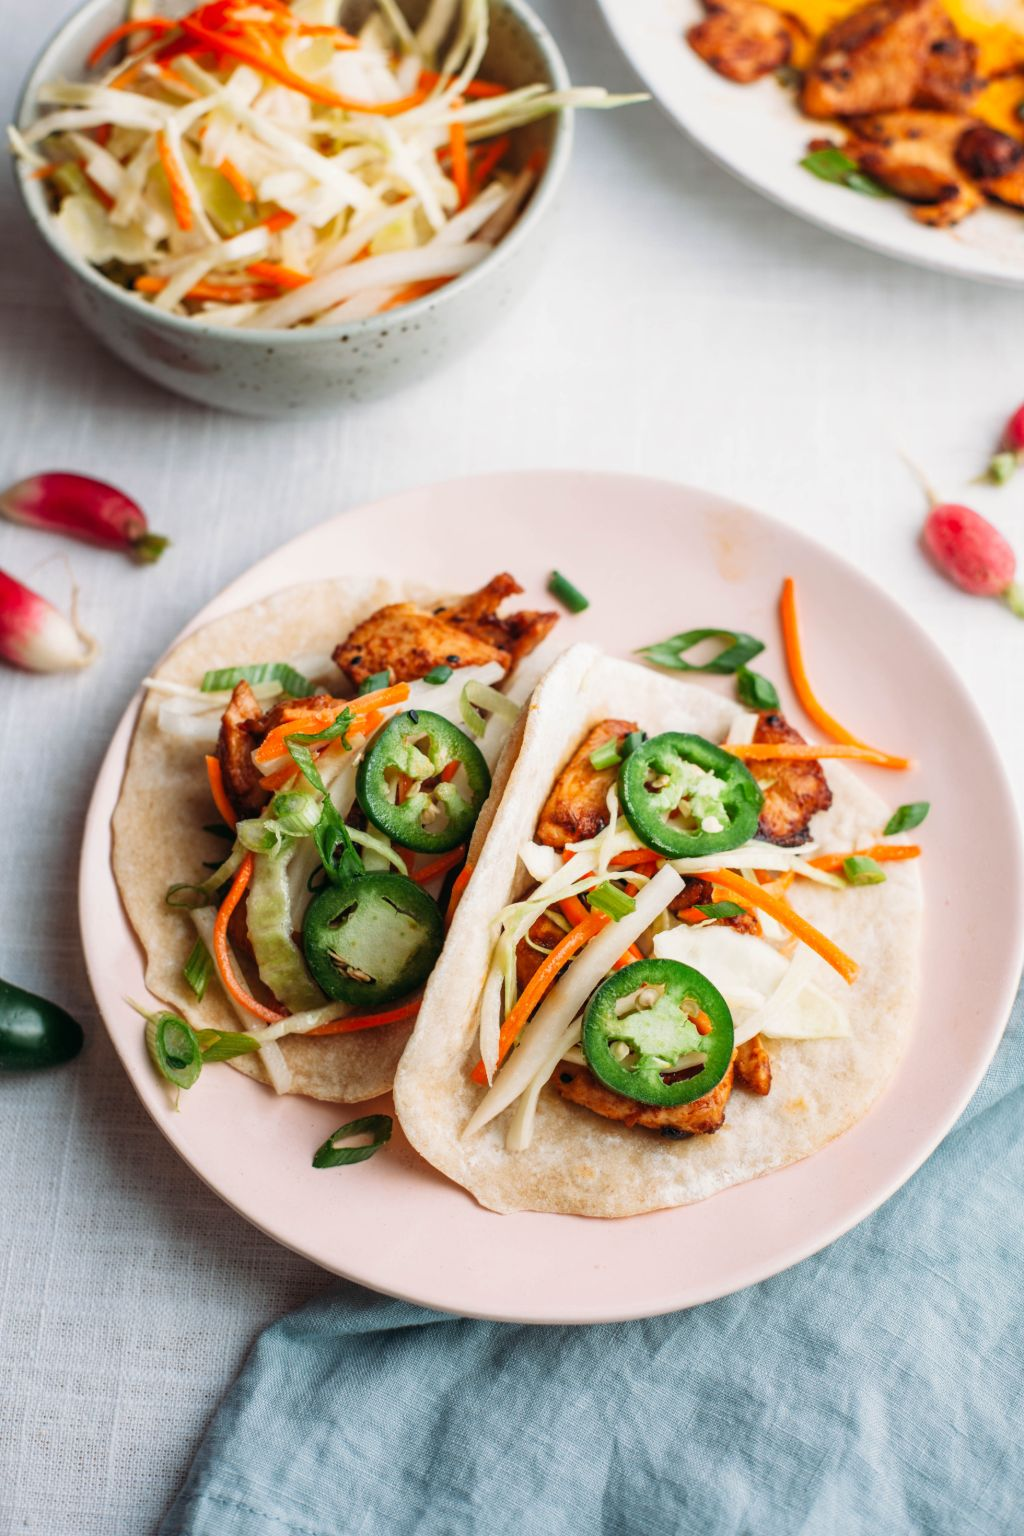 Bulgogi Tacos with Daikon Slaw - Tastemaker Blog